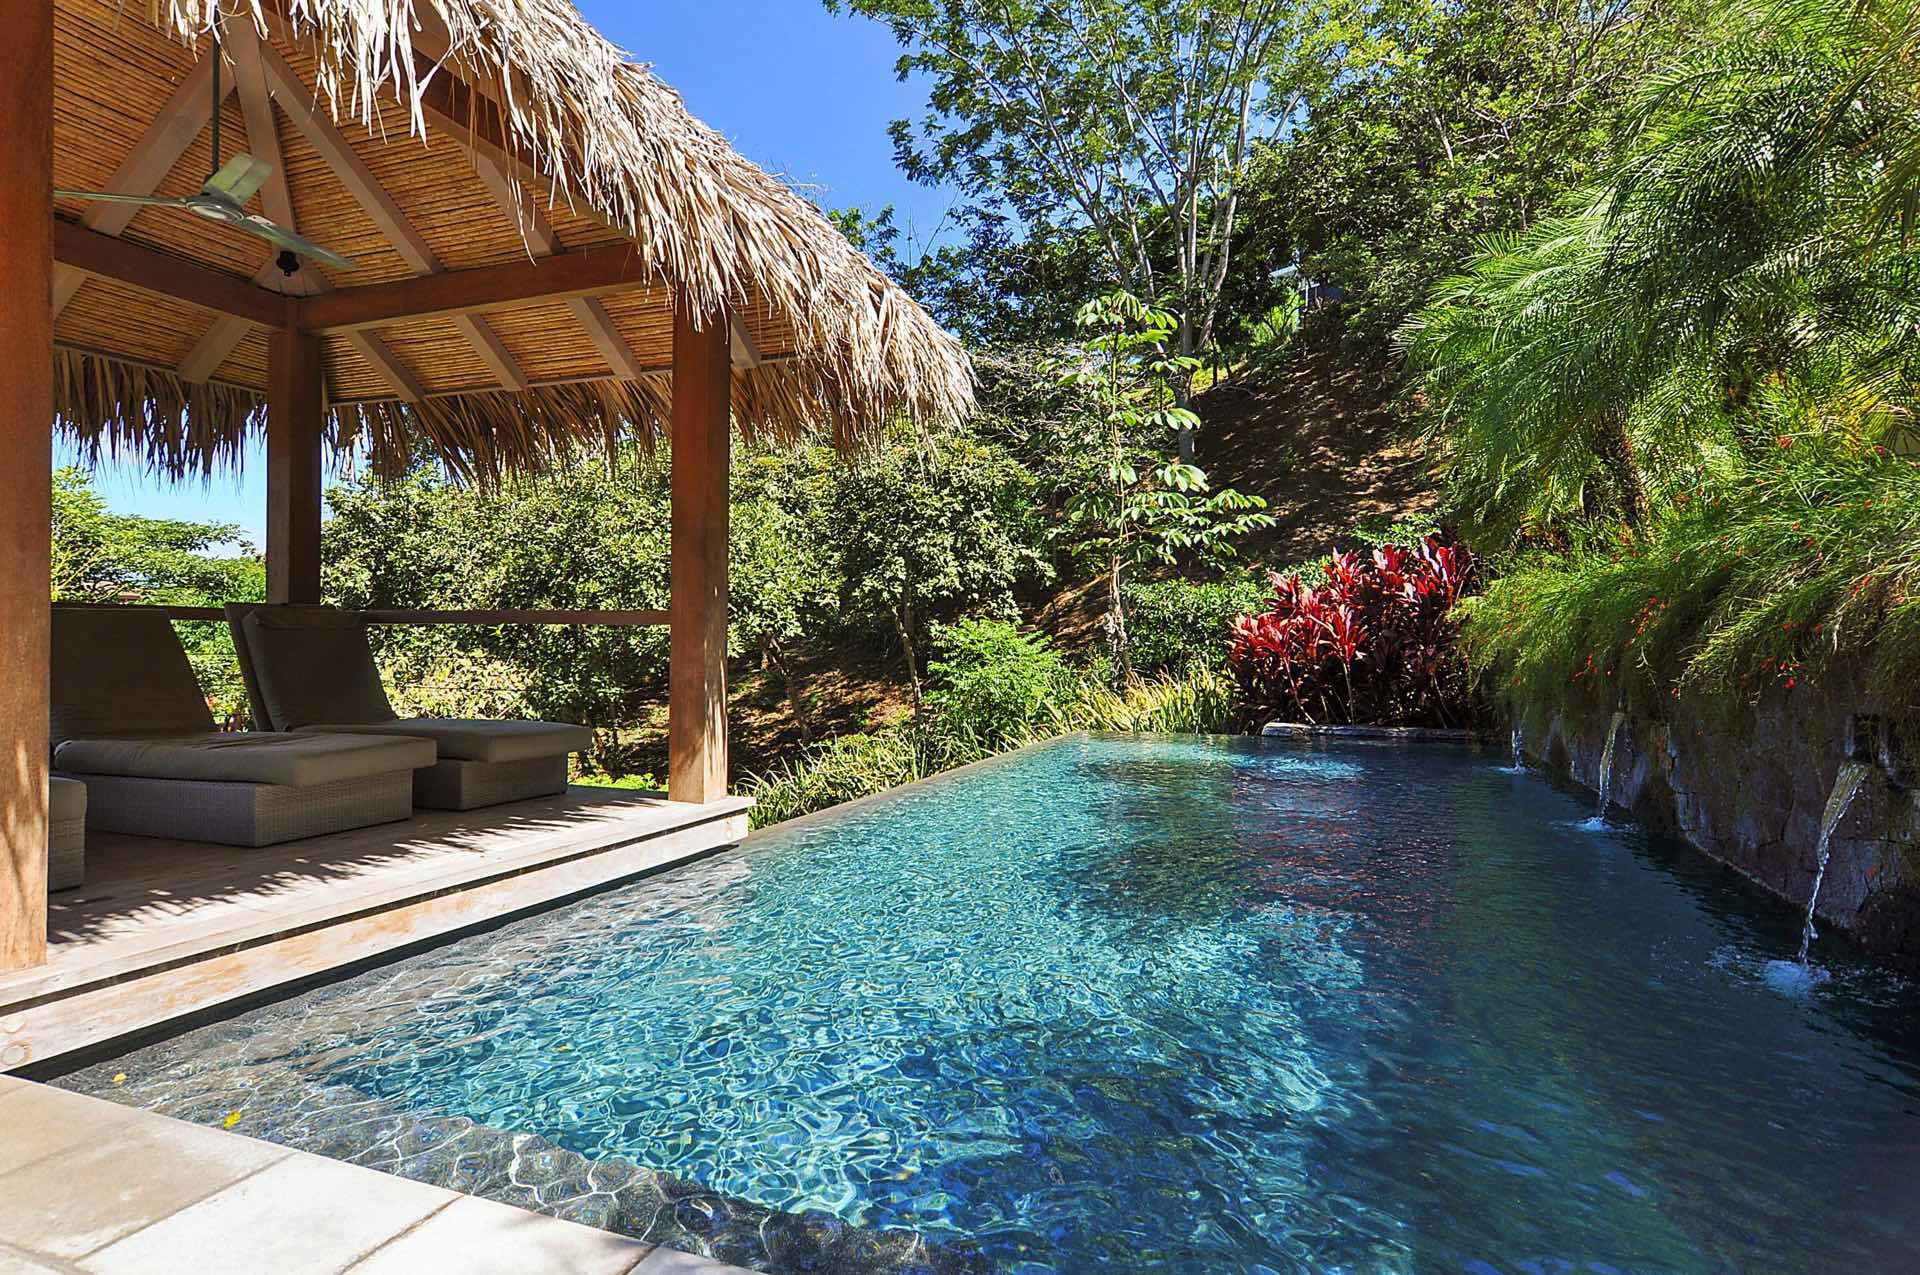 Las Mareas private resort pool